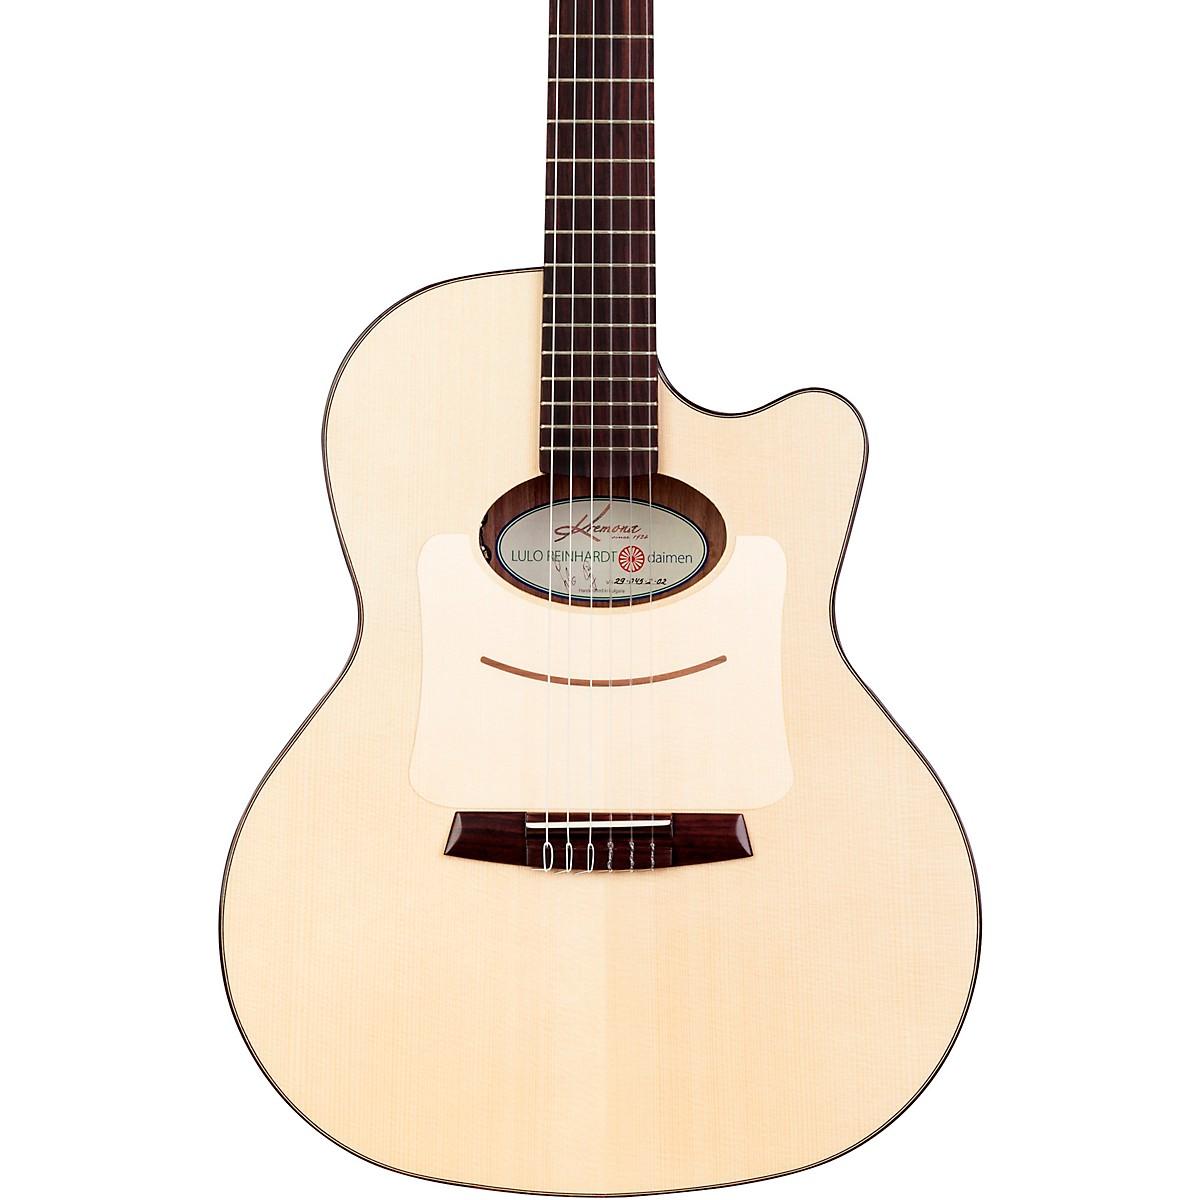 Kremona Lulo Reinhardt Daiman 14 Fret Nylon-String Acoustic-Electric Guitar